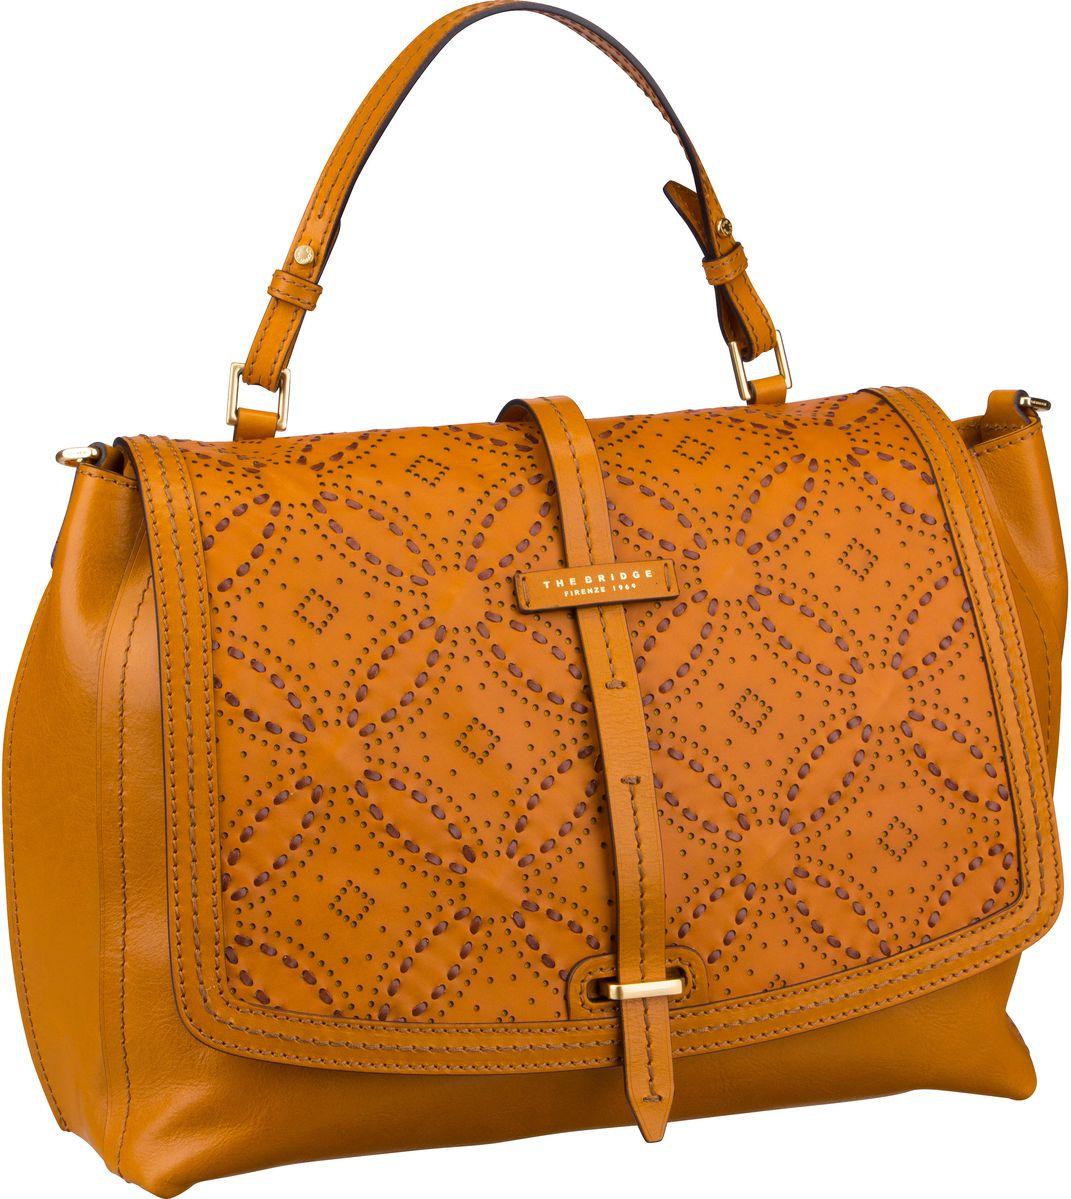 Handtasche Cerboli Handtasche 1327 Giallo Senape/Oro